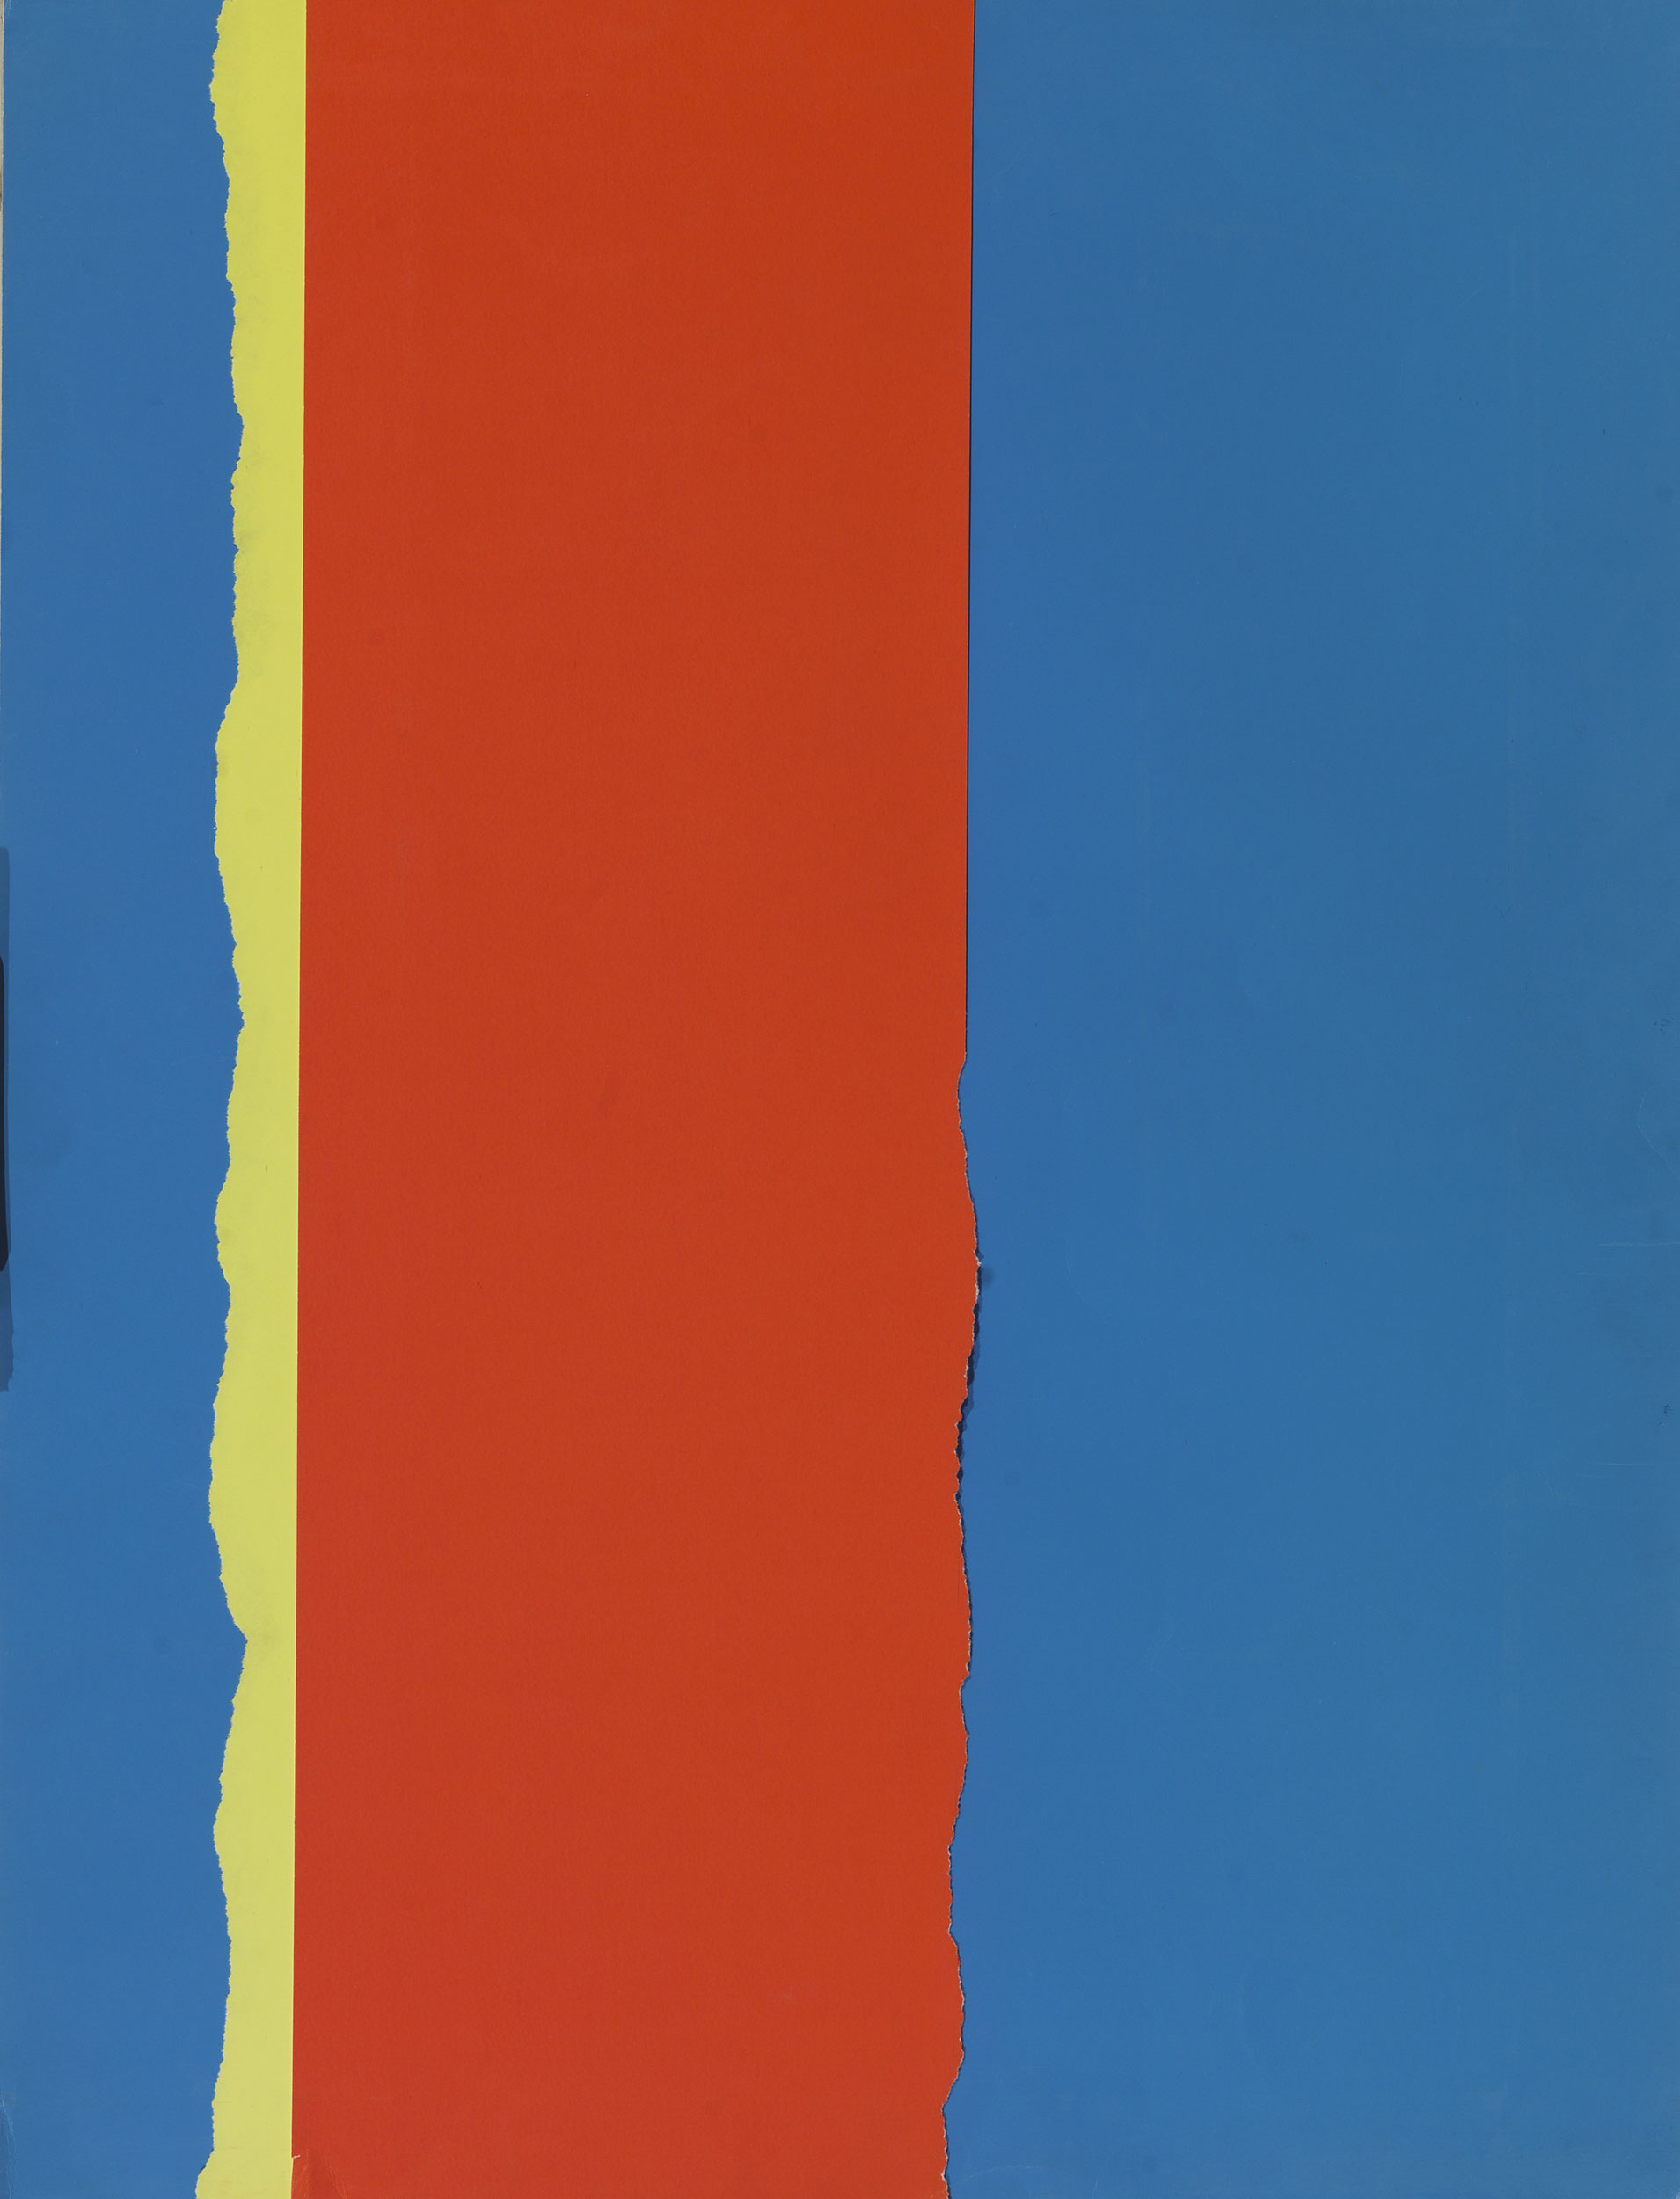 Stephen Antonakos - Untitled collage (JA#3) Berlin